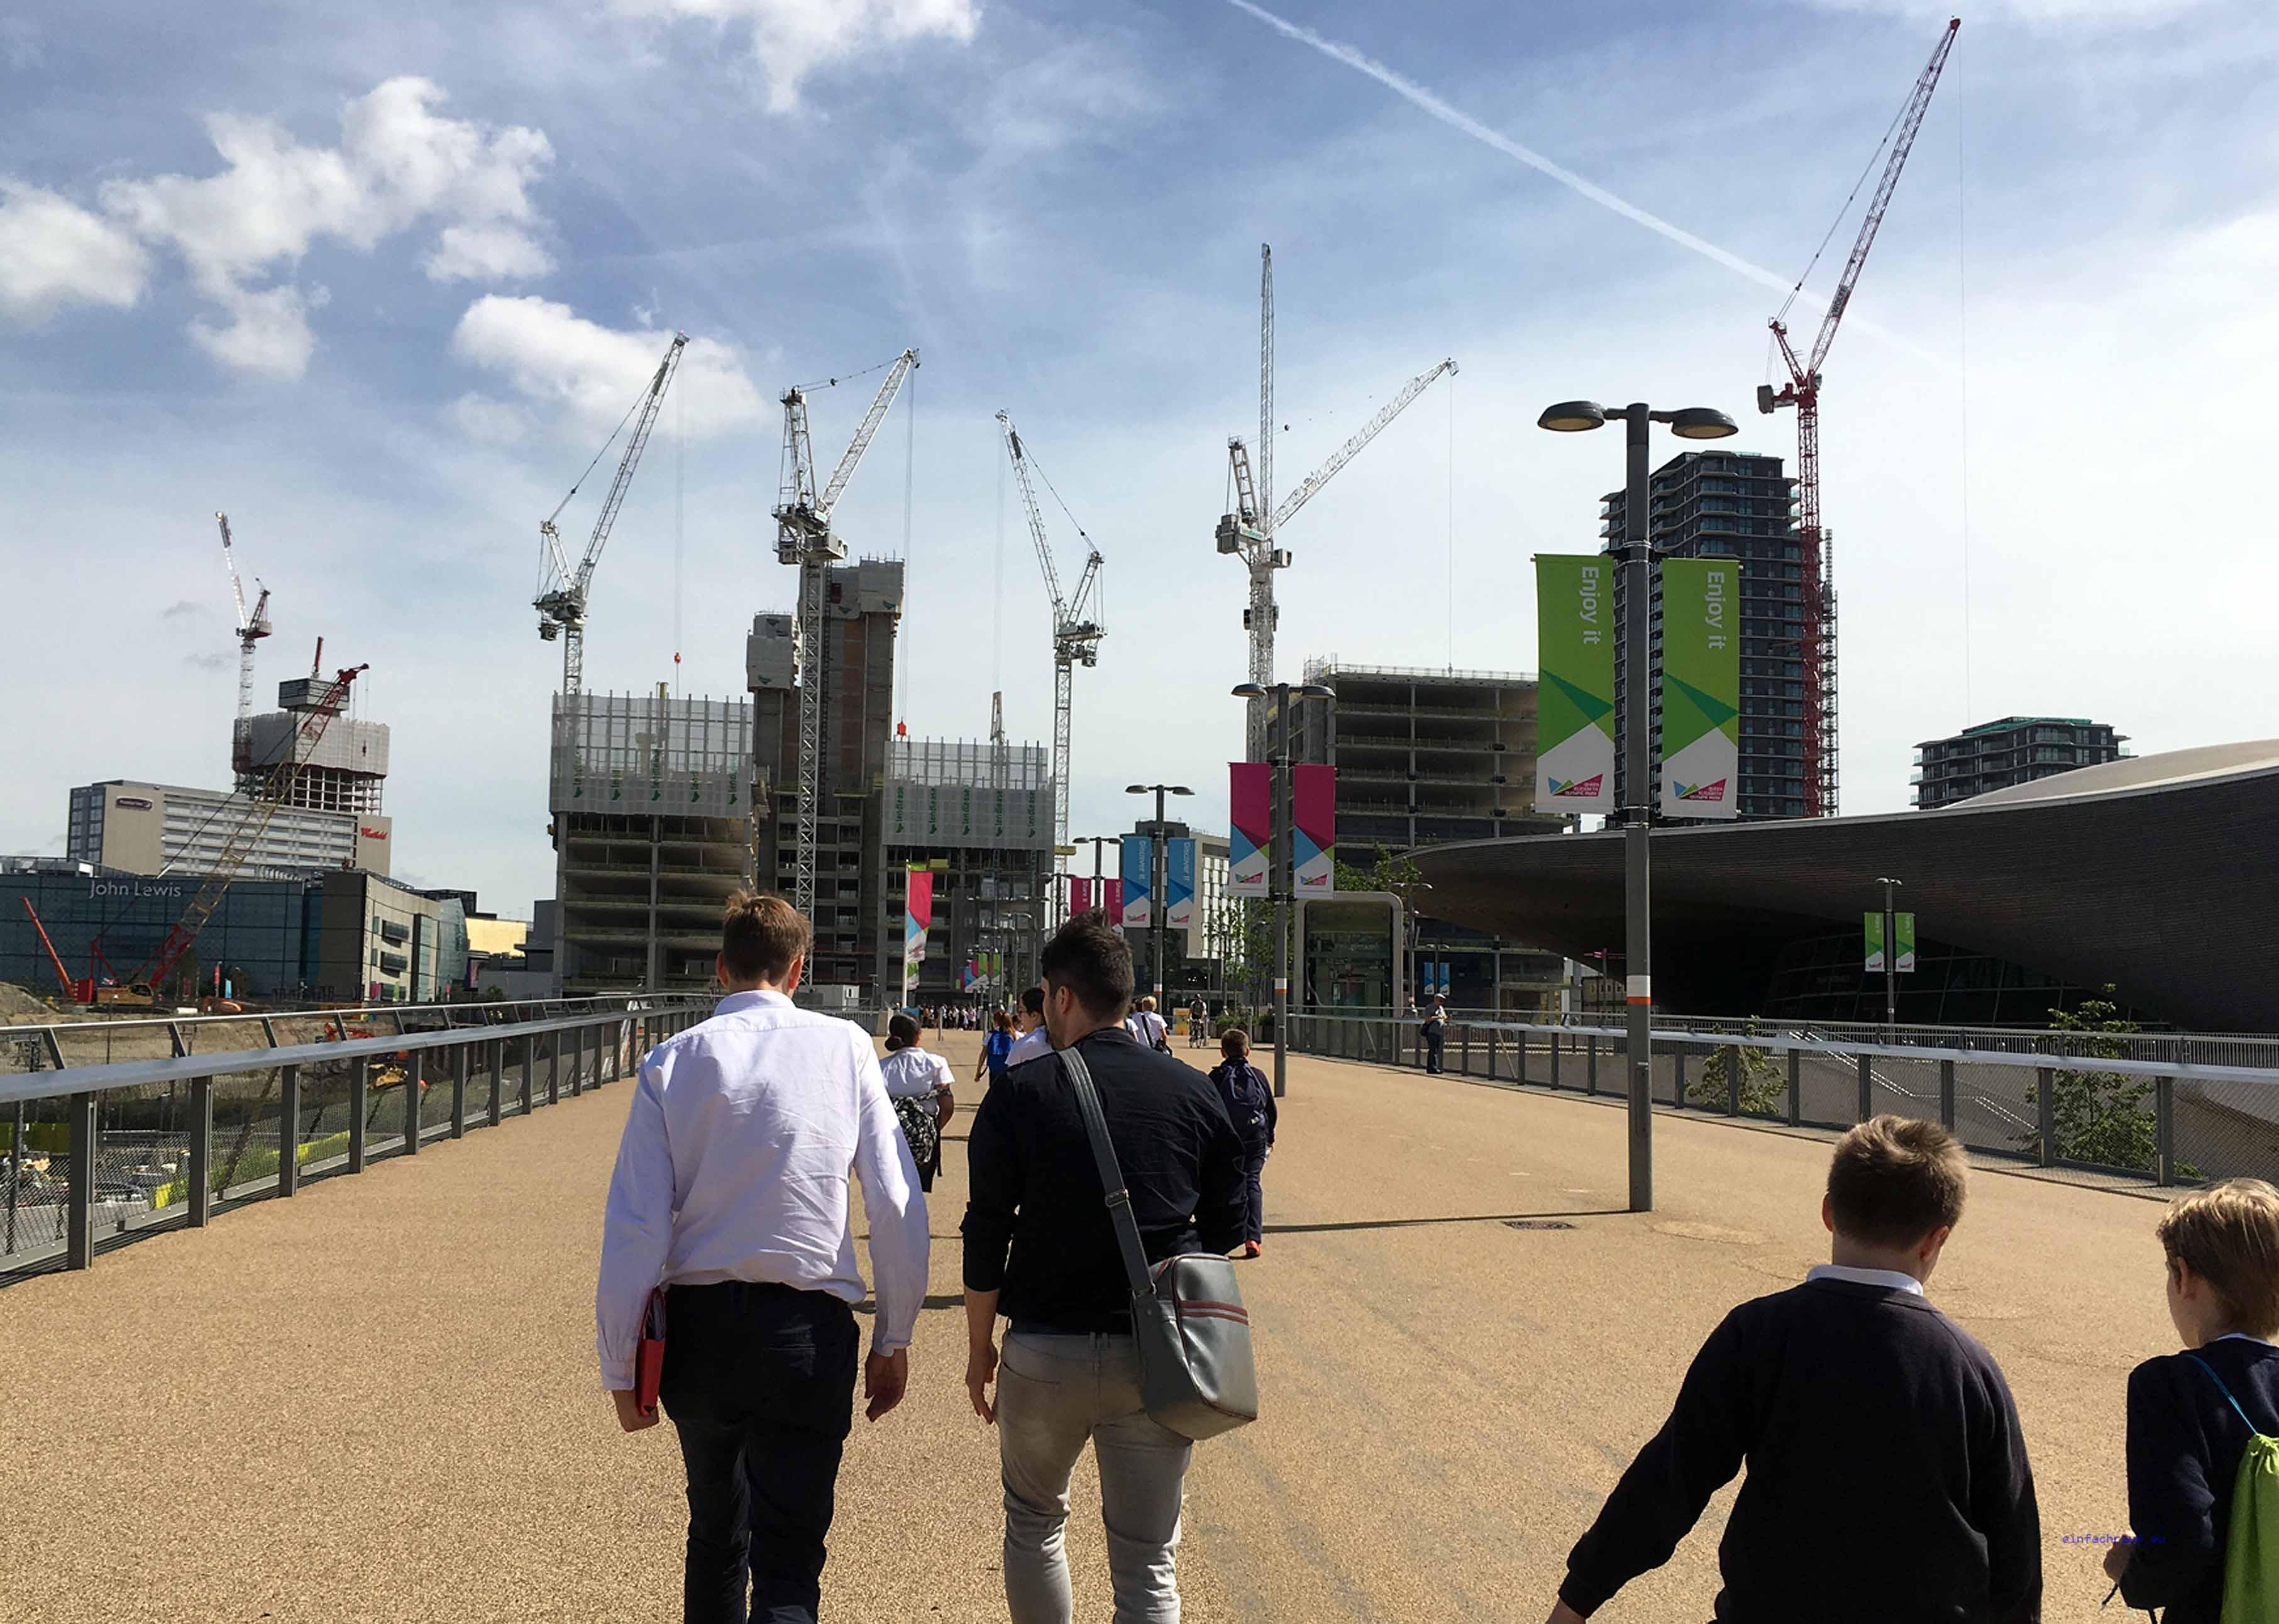 Überall wird gebaut in London